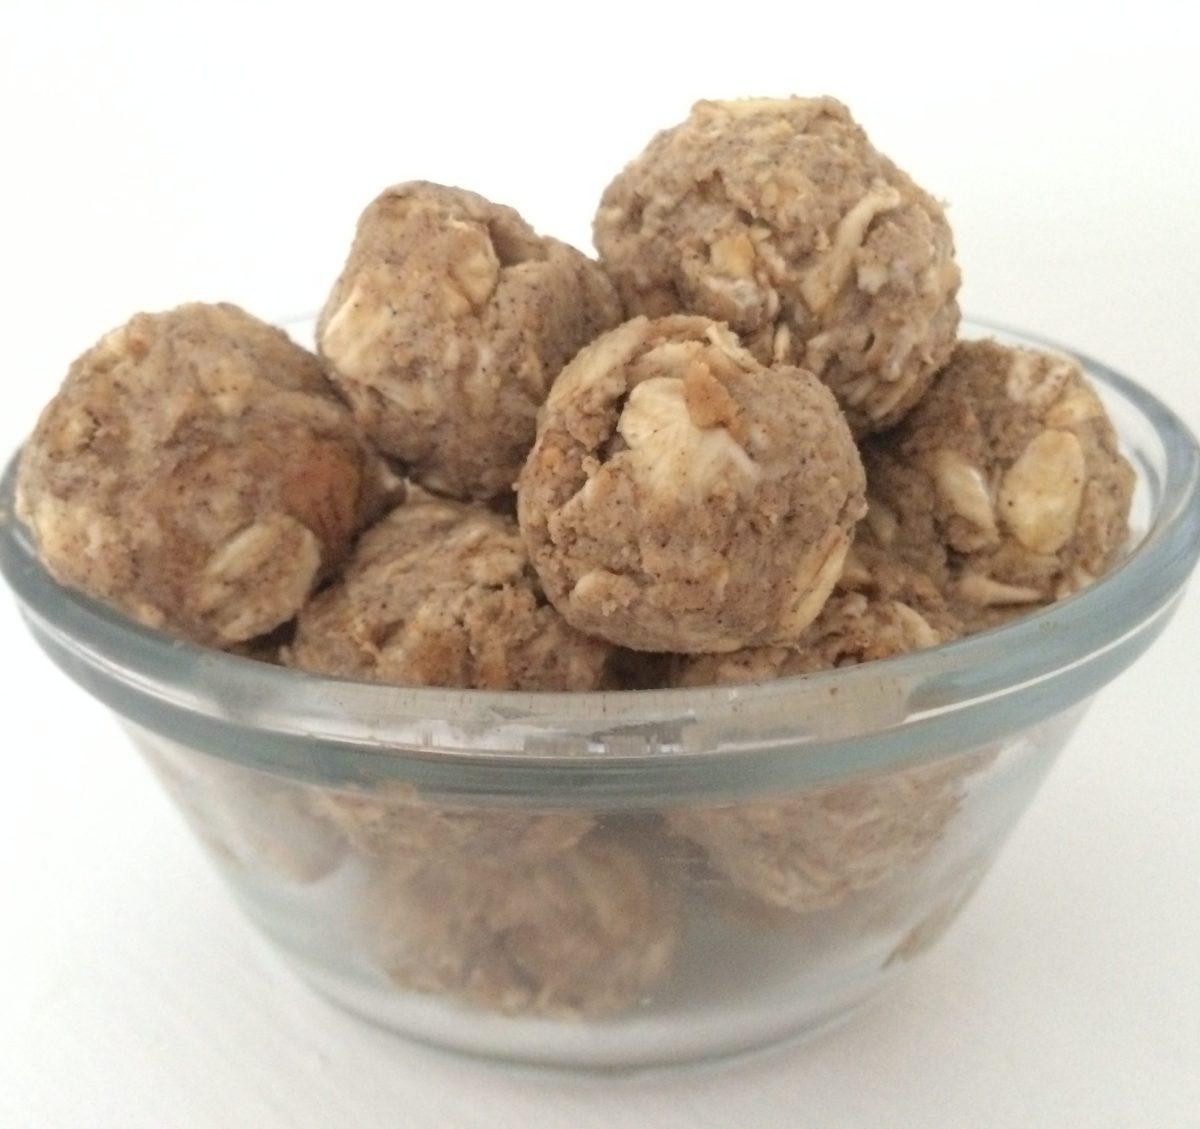 Oatmeal Peanut Butter Protein Balls [Clean, Vegan, Gluten-free]